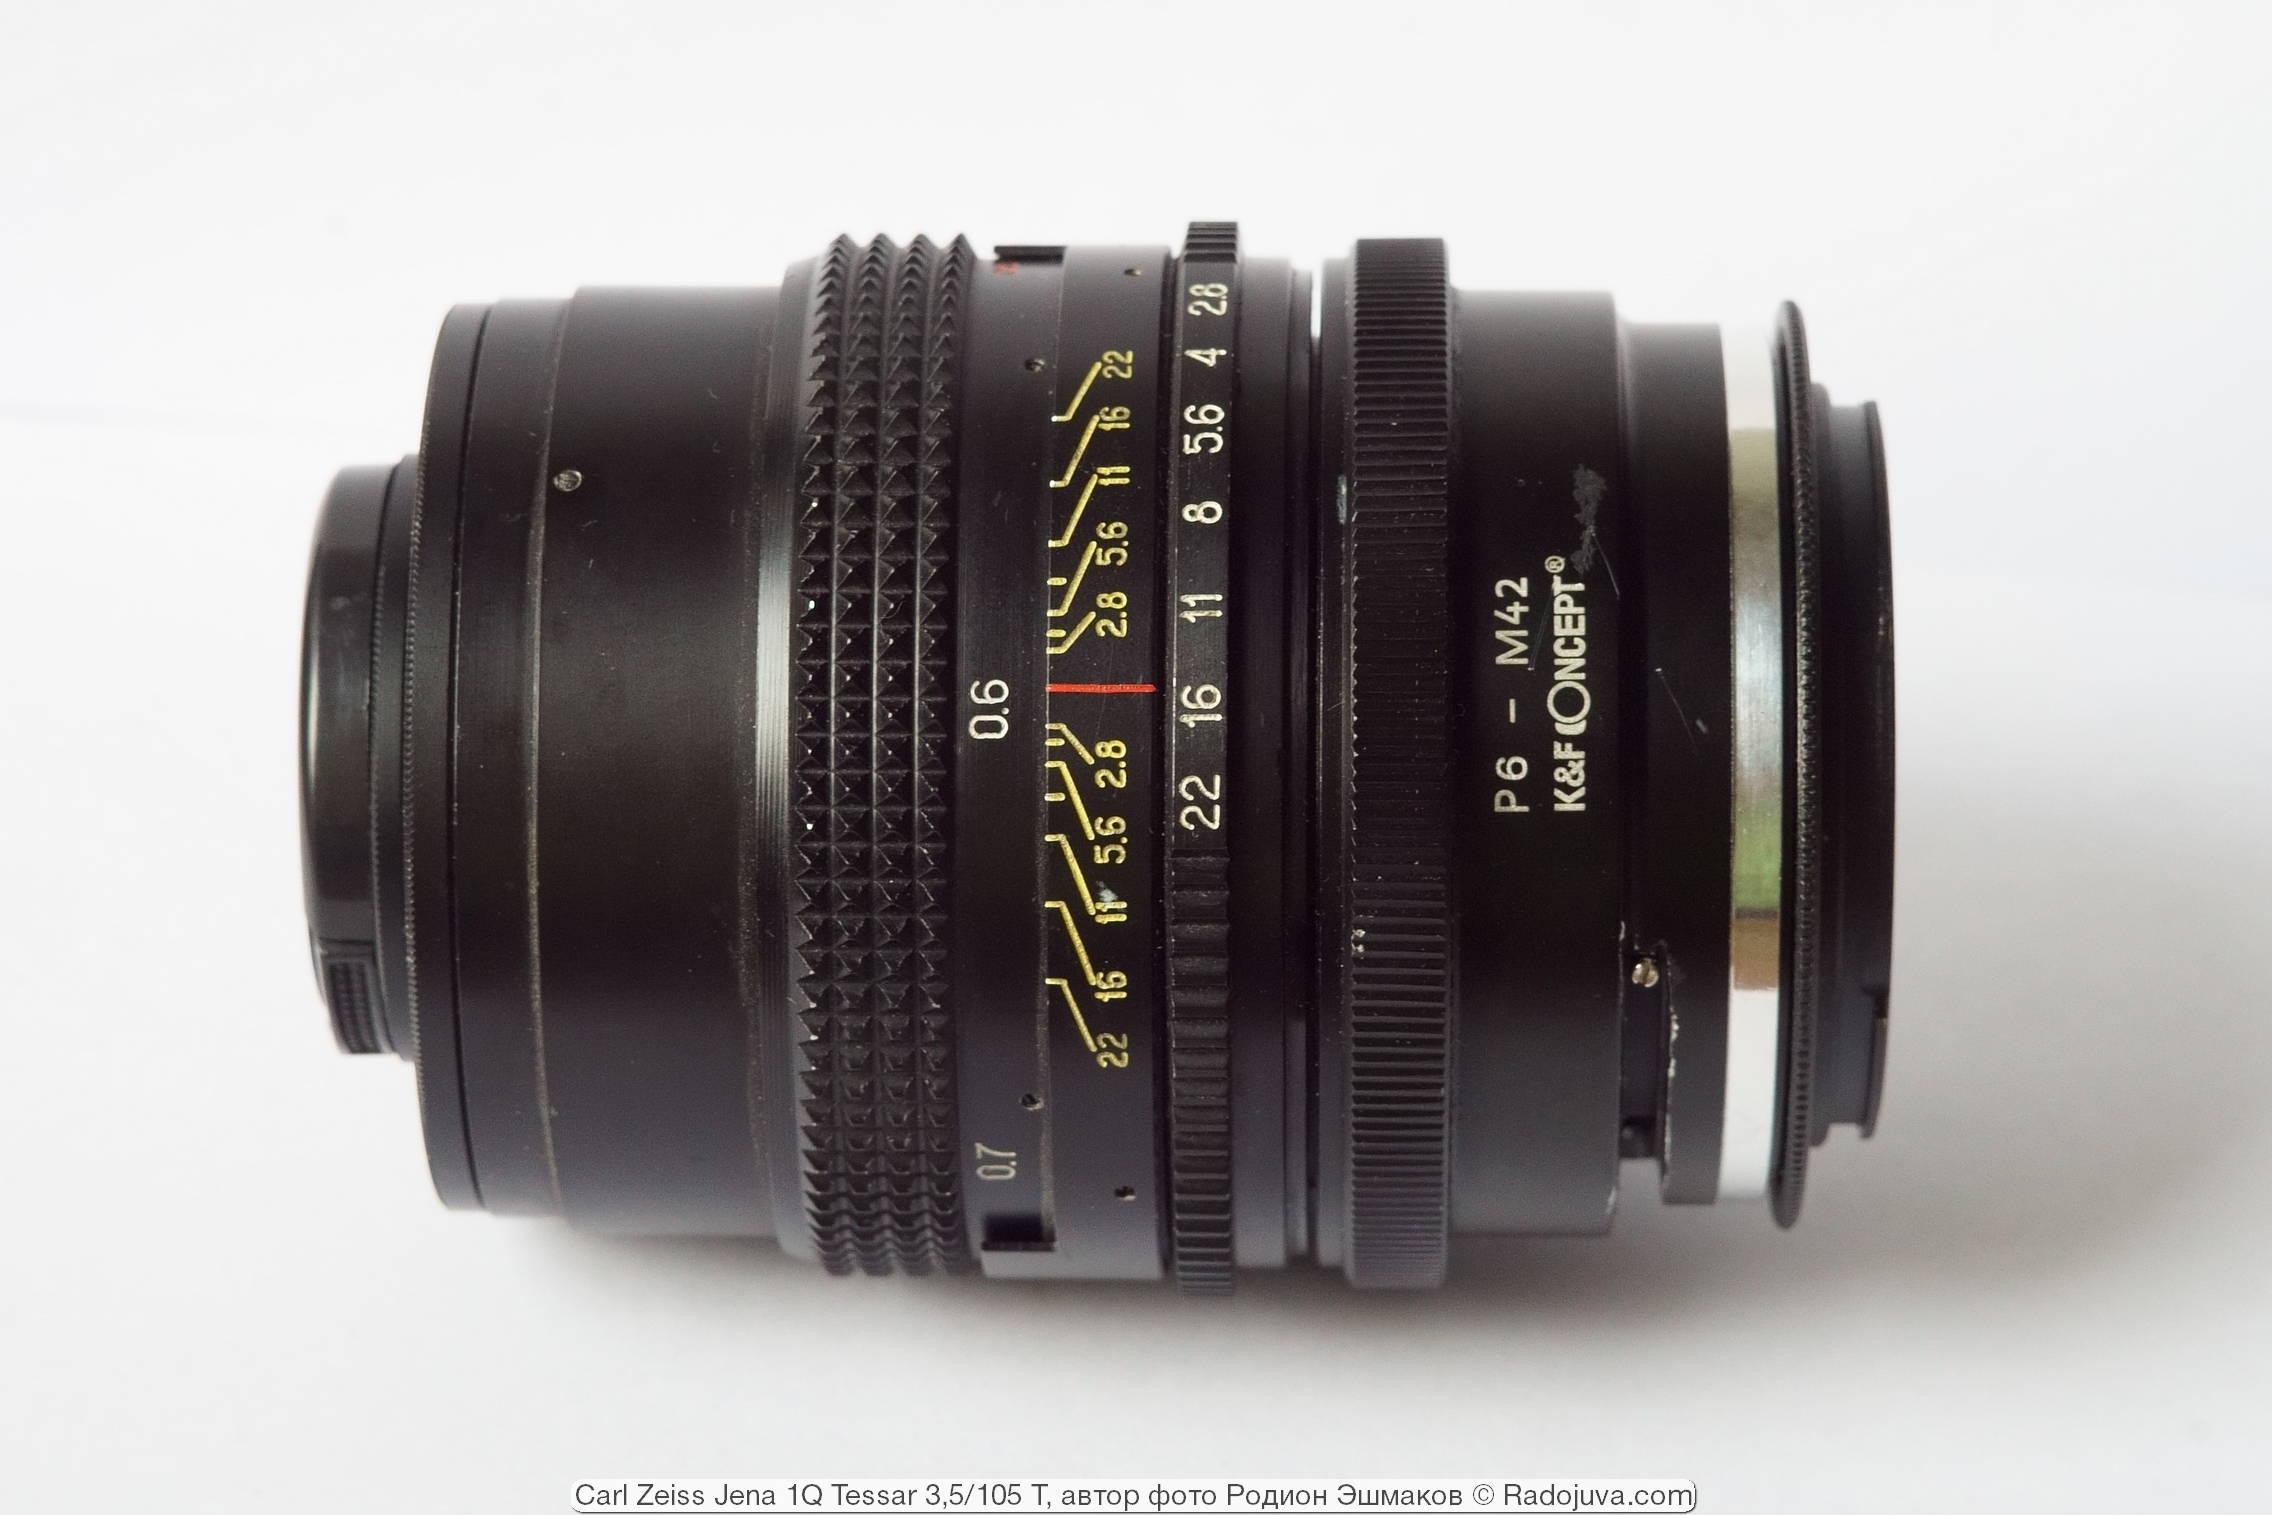 Вид объектива с адаптерами P6-M42 + M42/EOS при фокусировке на МДФ.